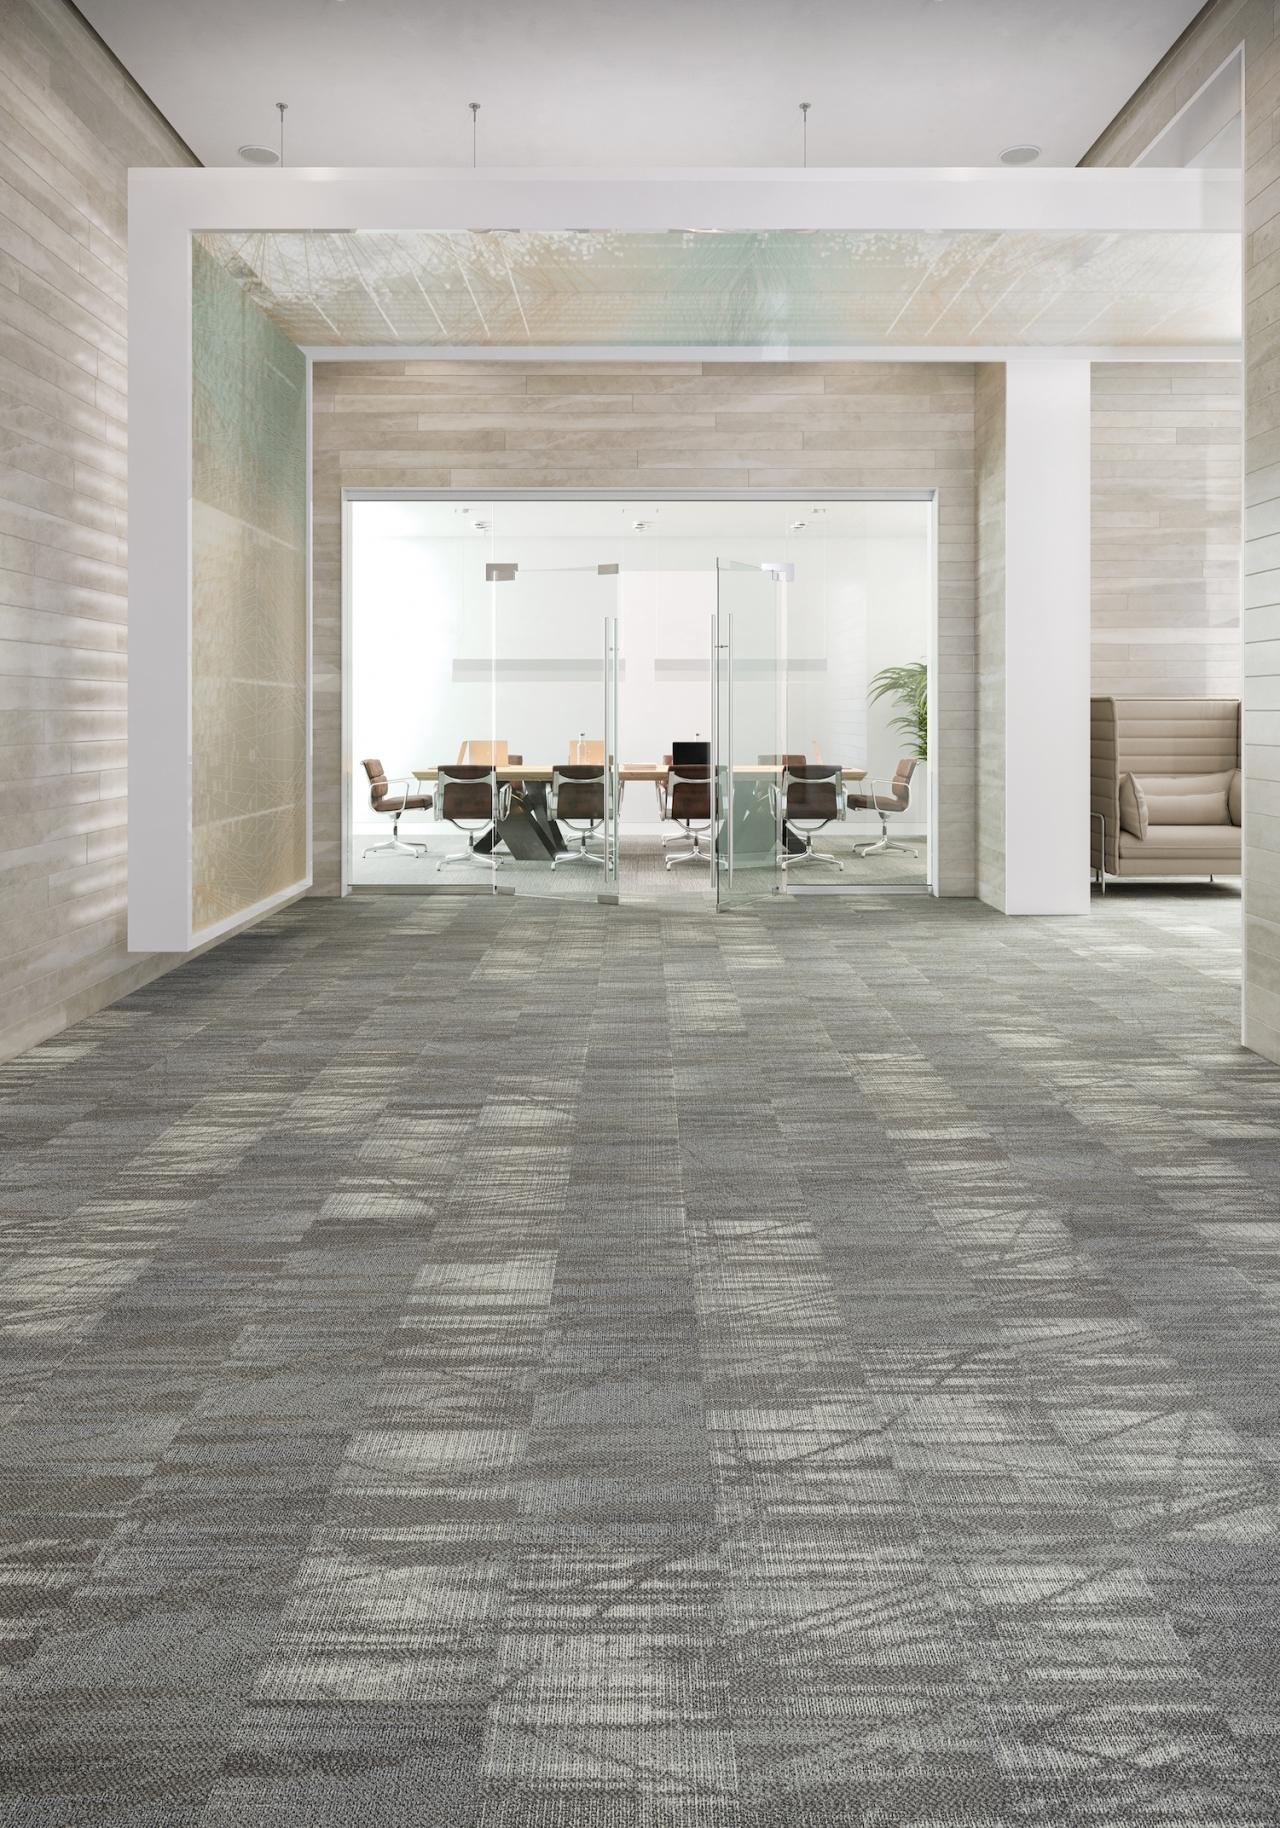 Data Tide tiles in a room as flooring